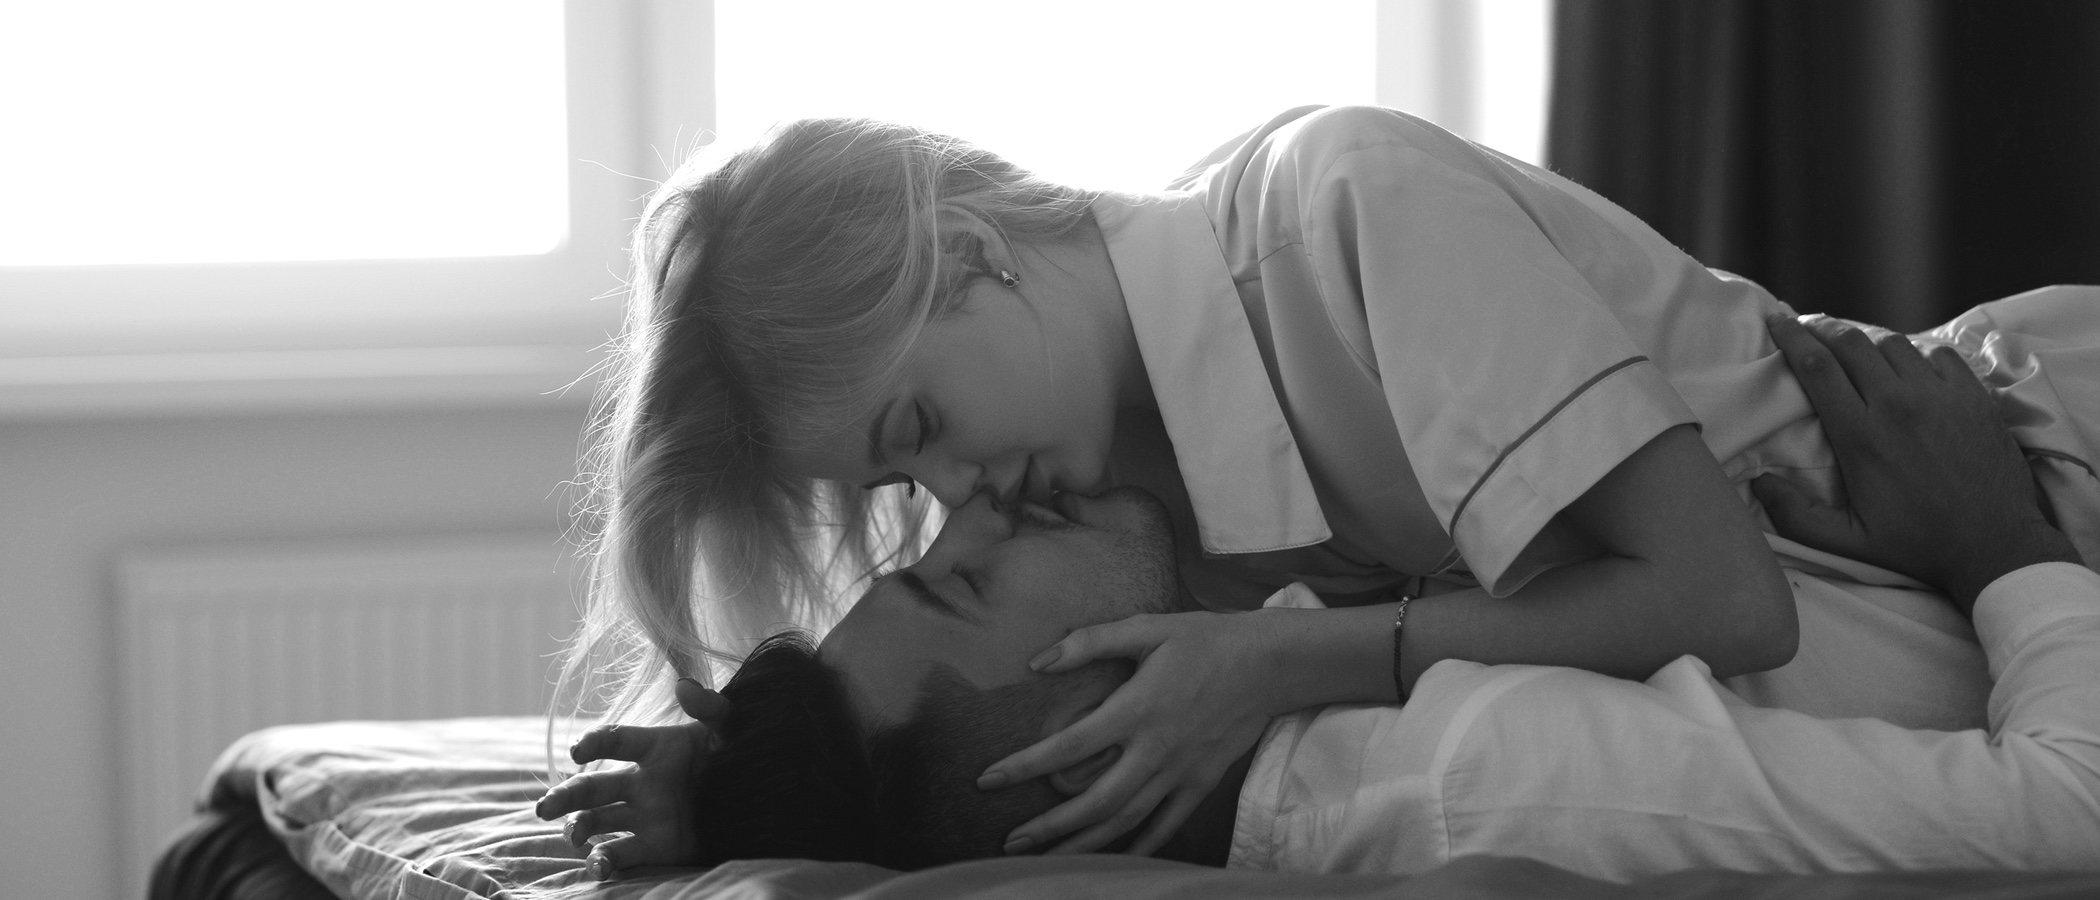 Horóscopo sexual diciembre 2018: Piscis